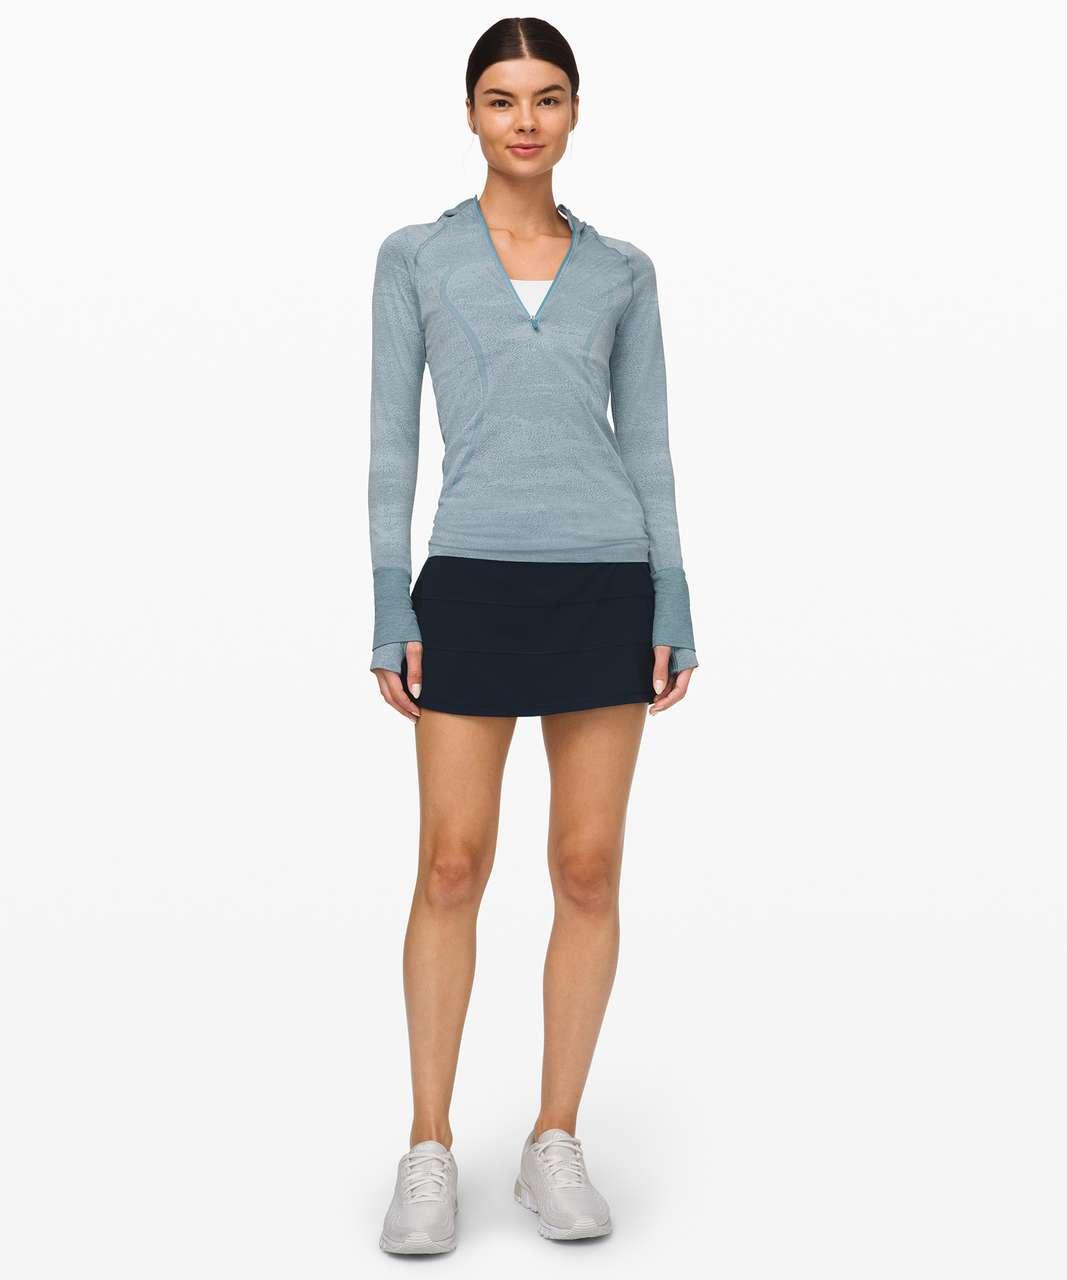 "Lululemon Pace Rival Skirt (Regular) *4-way Stretch 13"" - True Navy (First Release)"